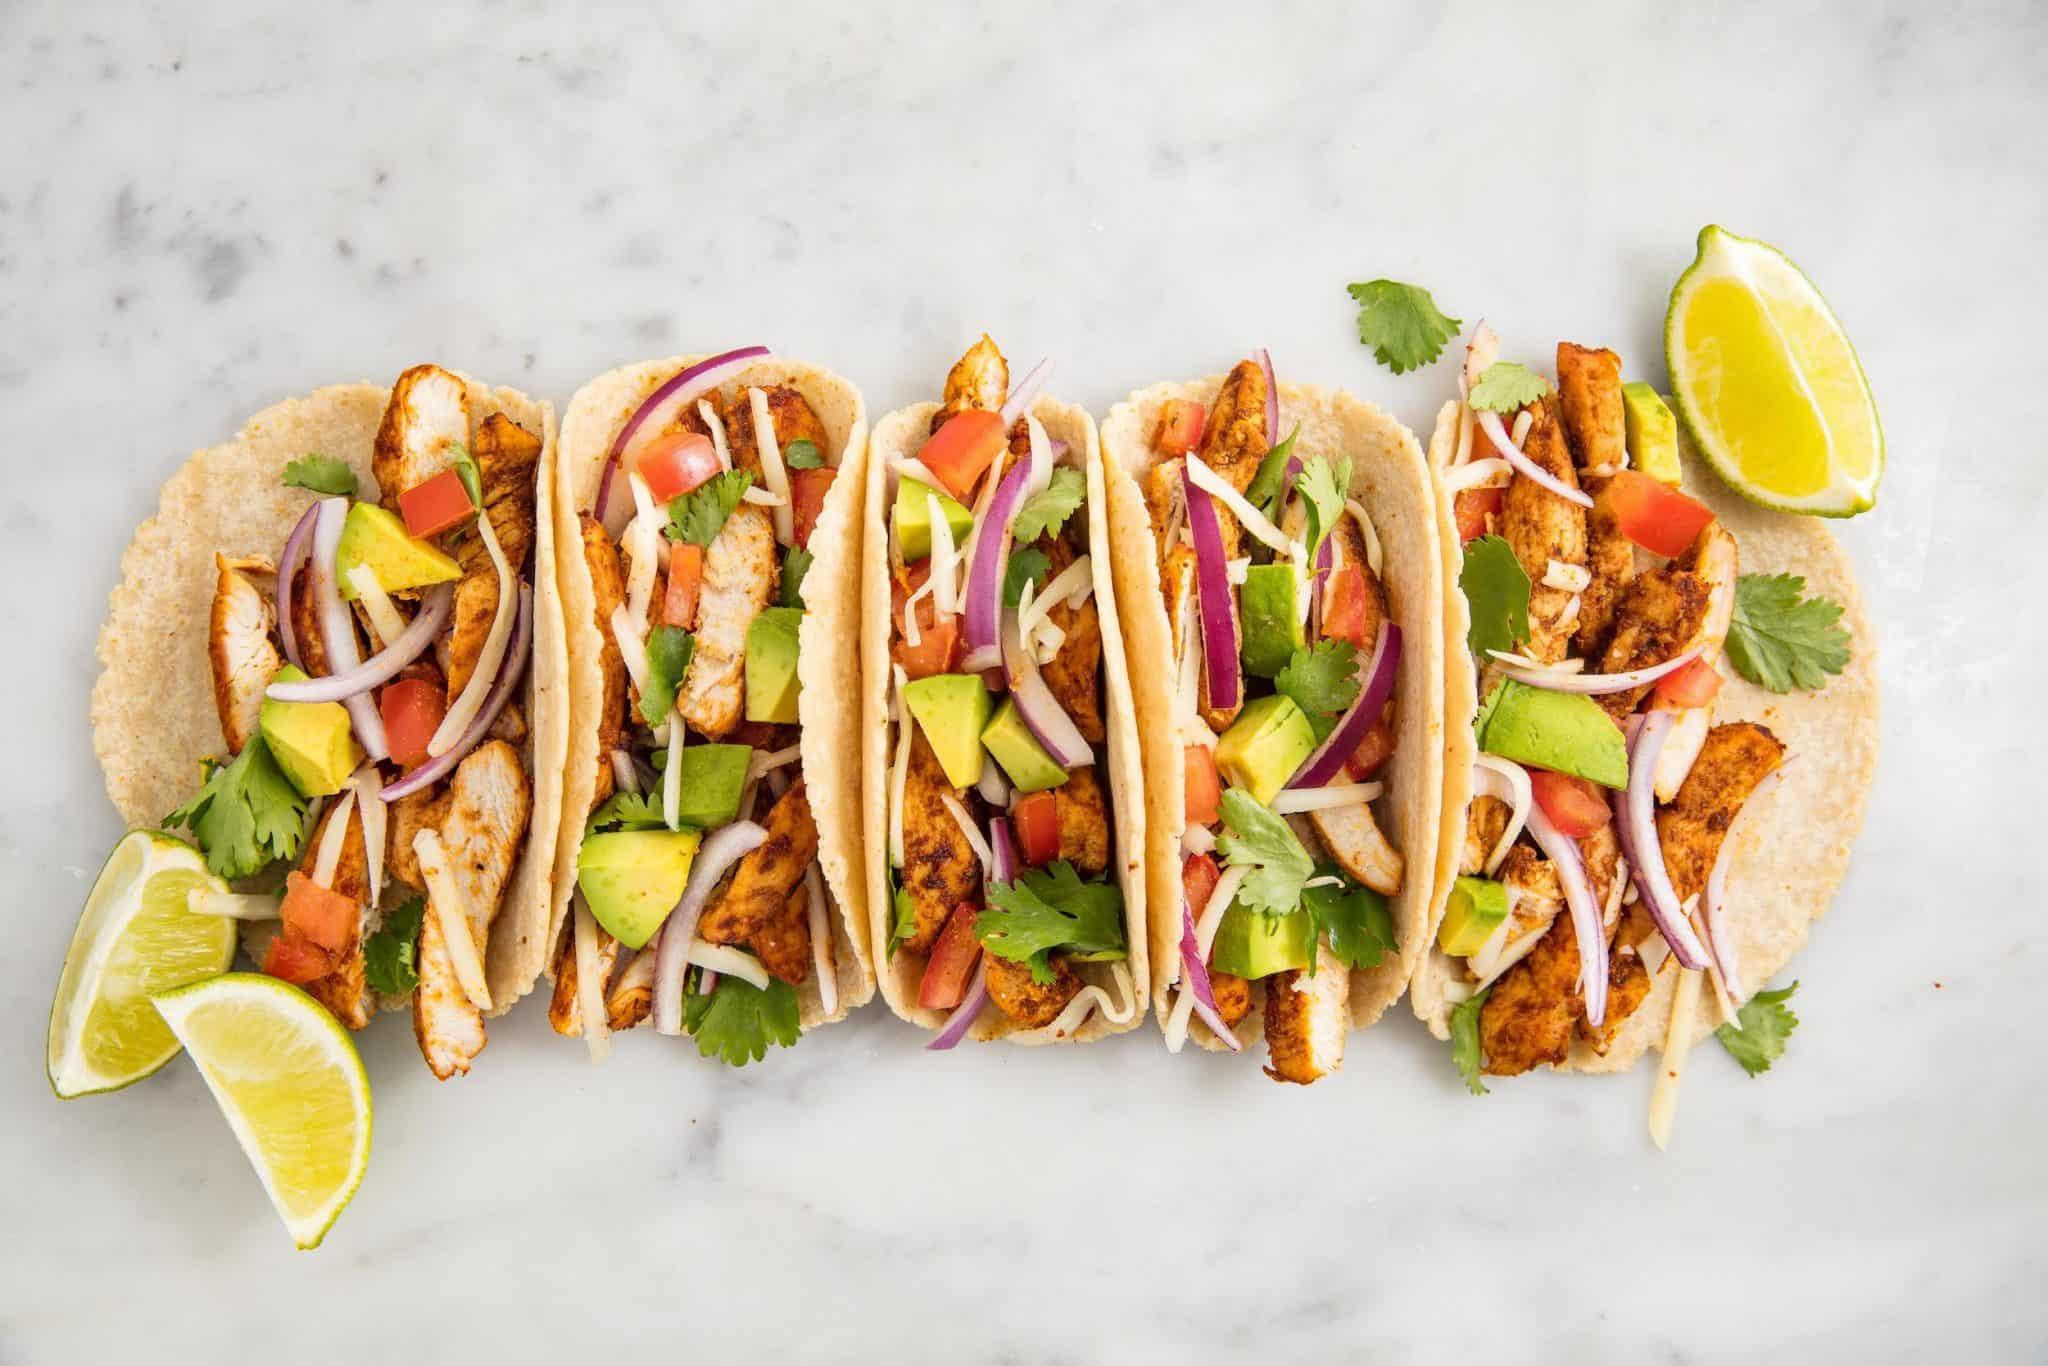 Taco + Quiz on Tuesdays at Marina Muse